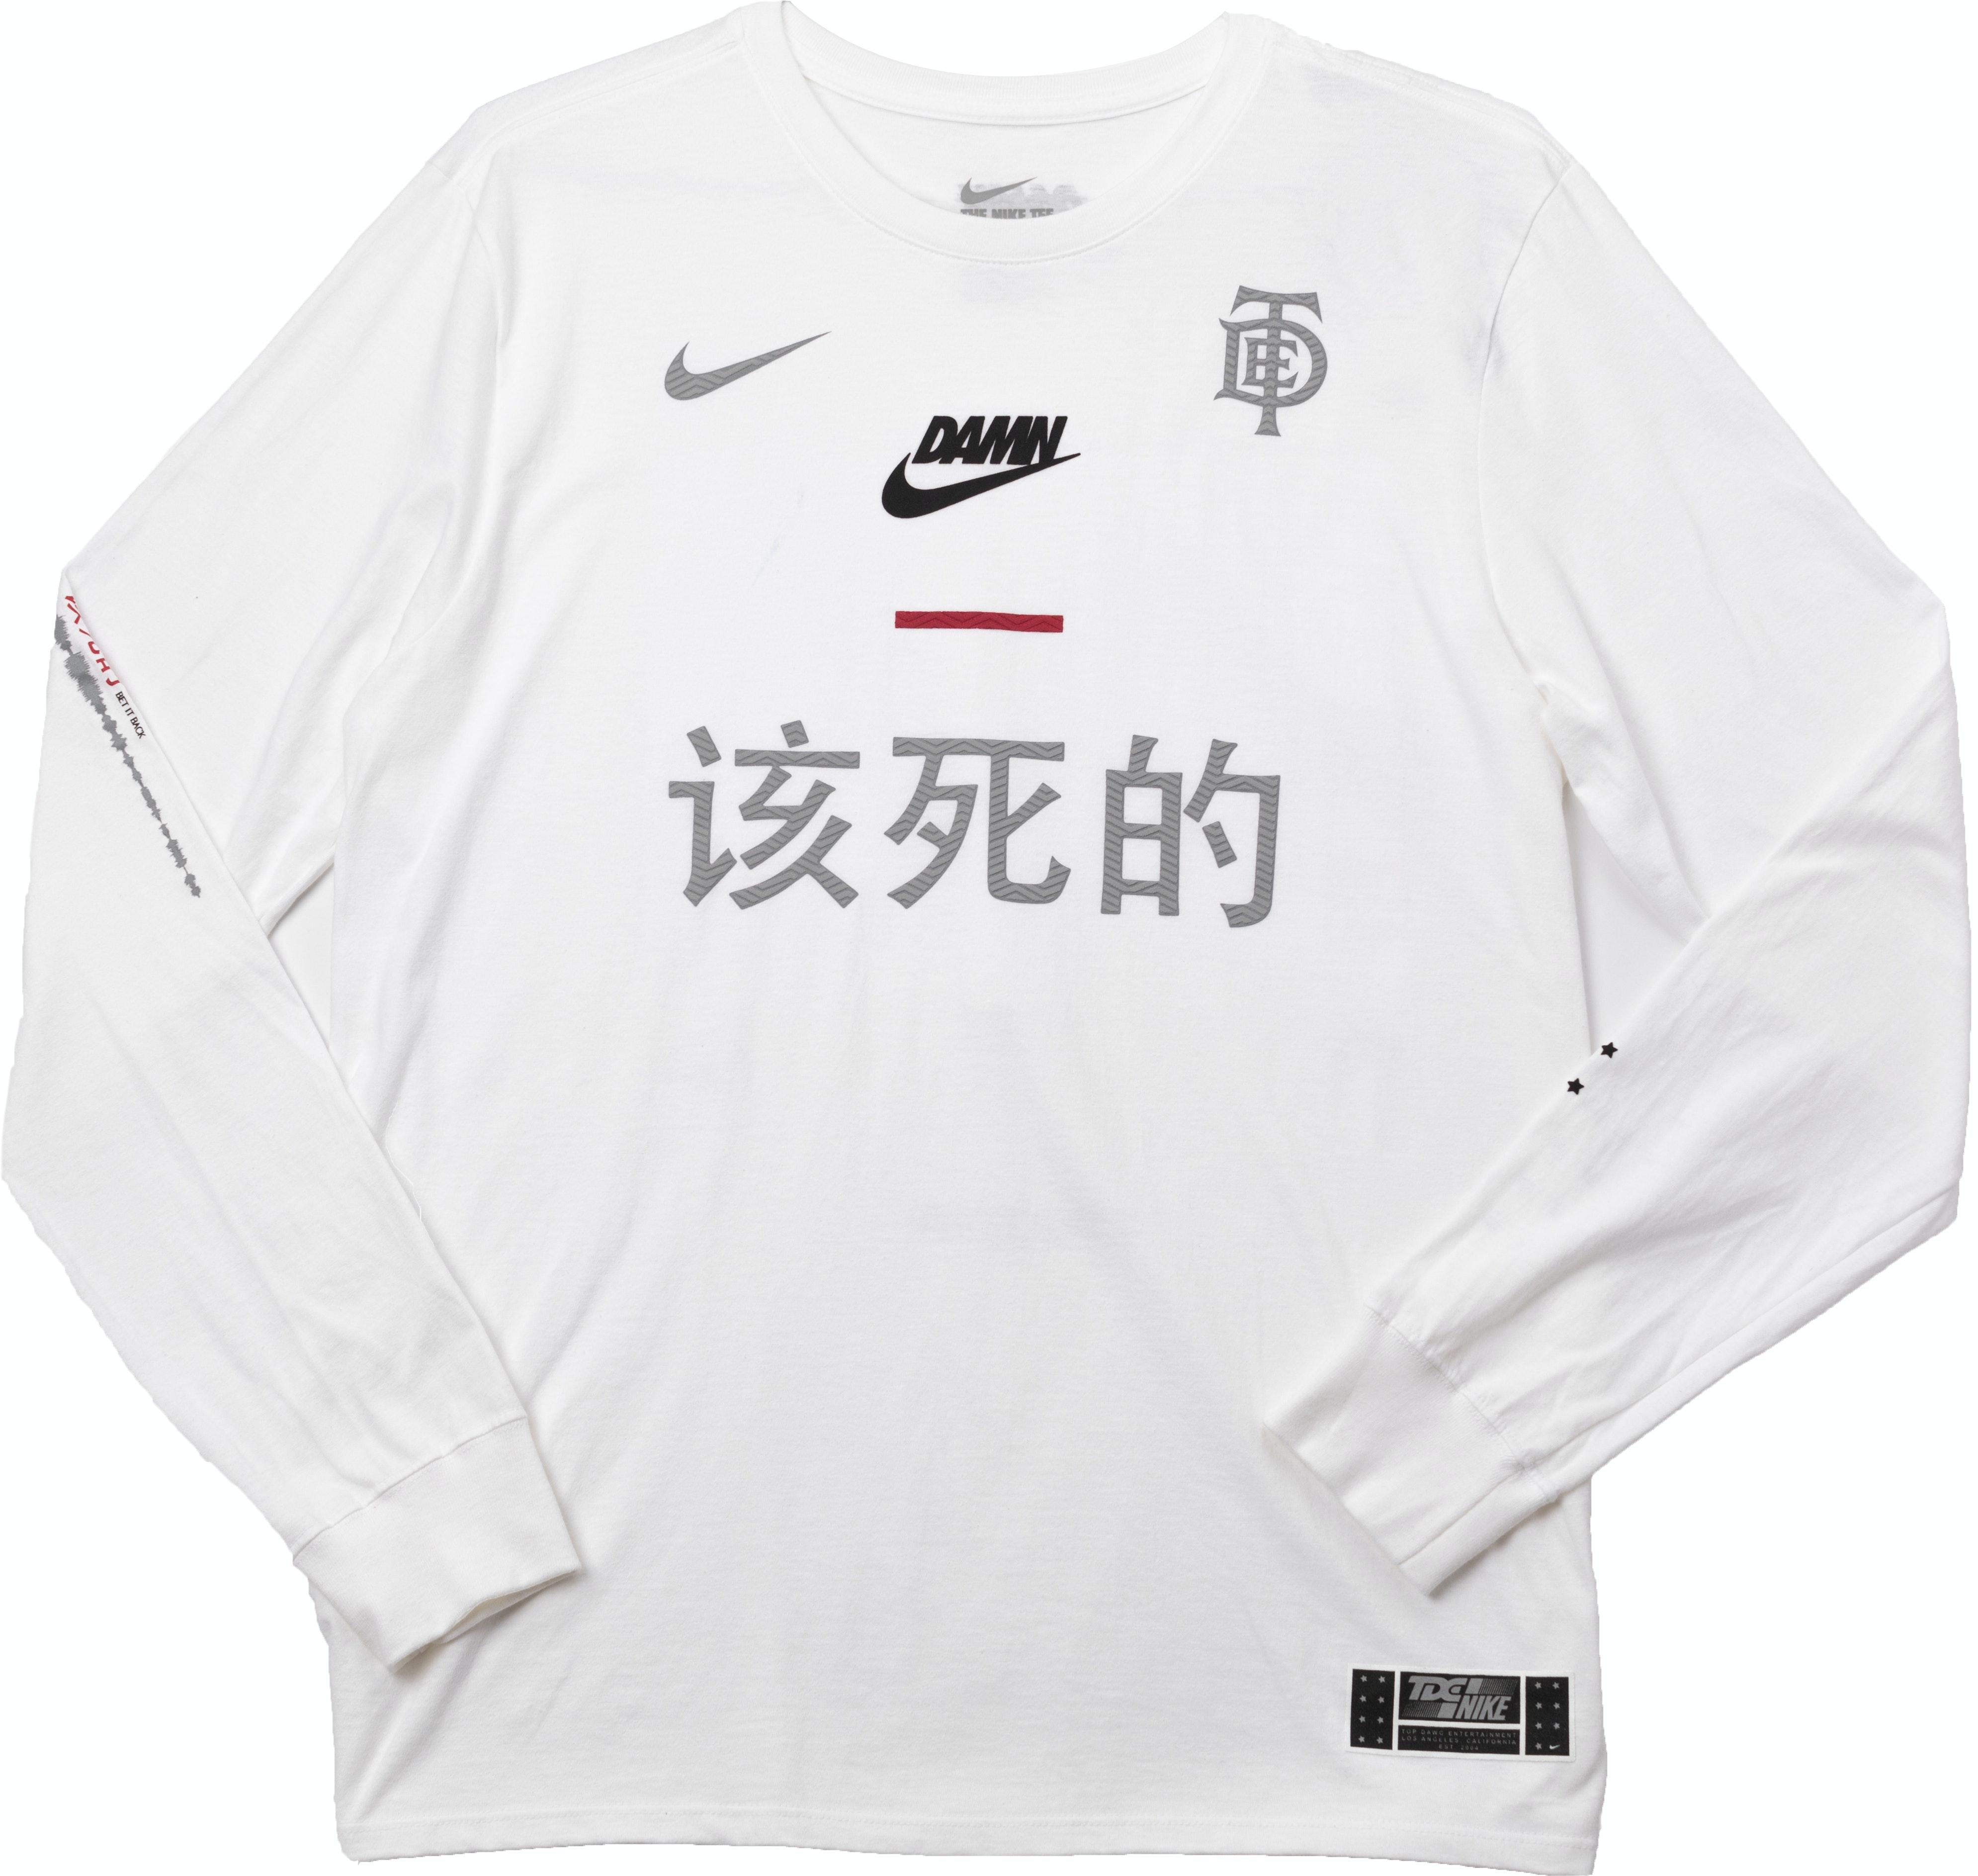 Tde X Nike Swoosh Long Sleeve Tde White by Stock X